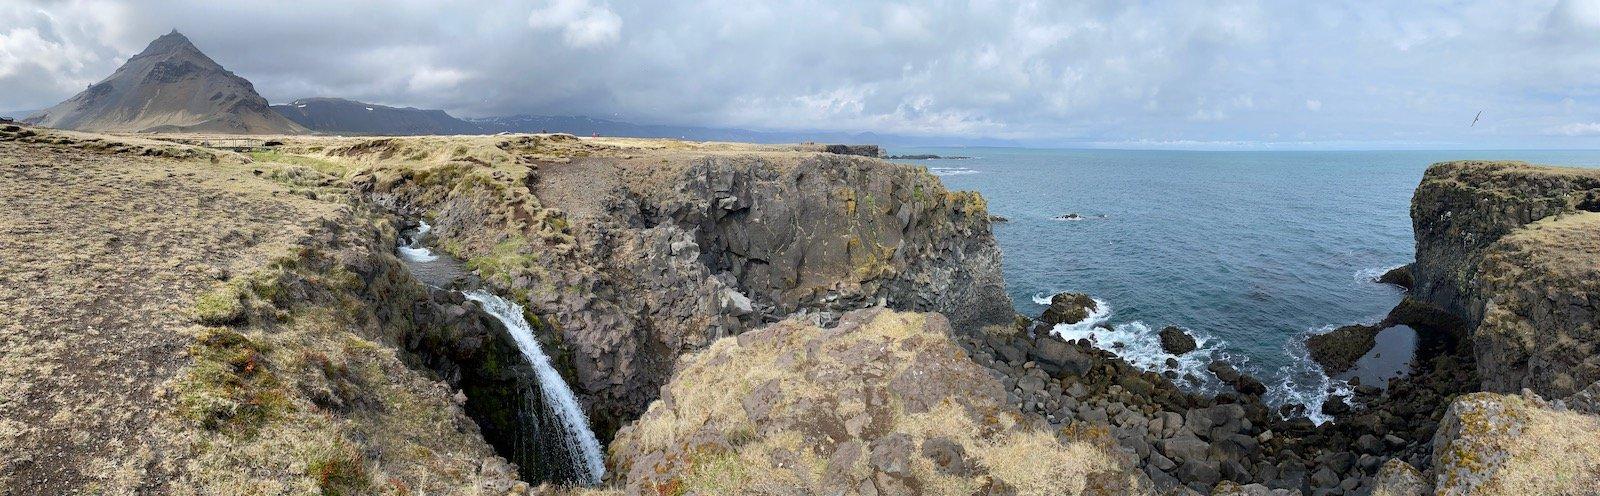 Scenic view of Near Arnarstapi on the Snæfellsnes Peninsula in Iceland.